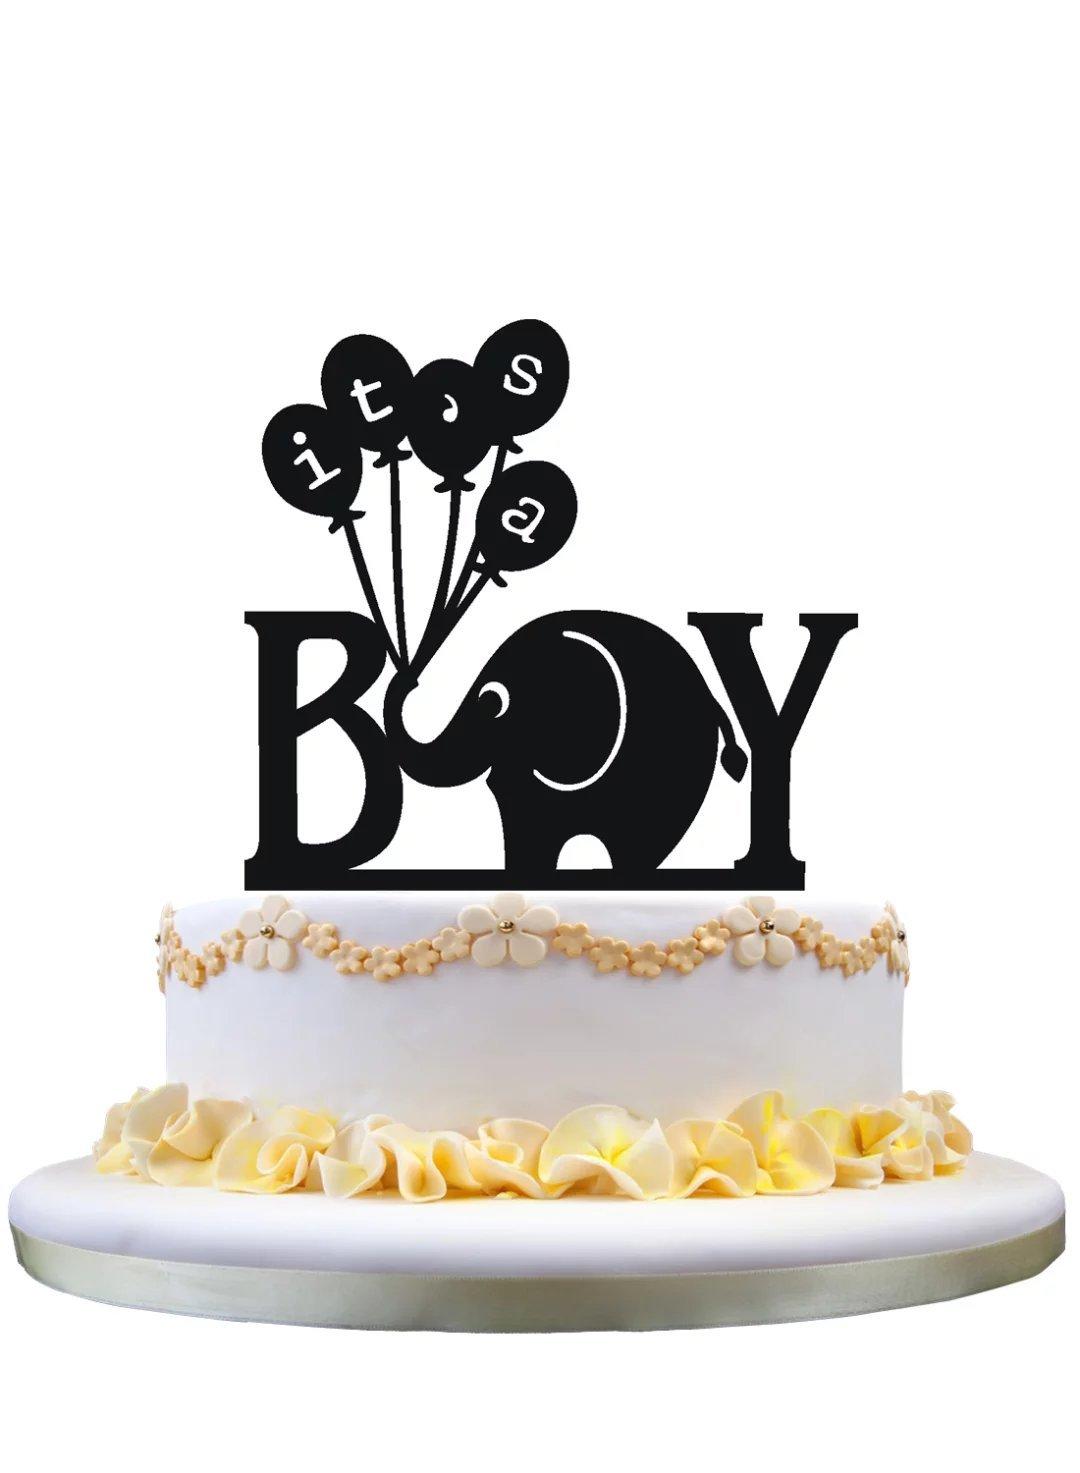 Pleasant Birthday Cake Topper Monogram Cake Tiopper Its A Boy Cake Topper Birthday Cards Printable Opercafe Filternl